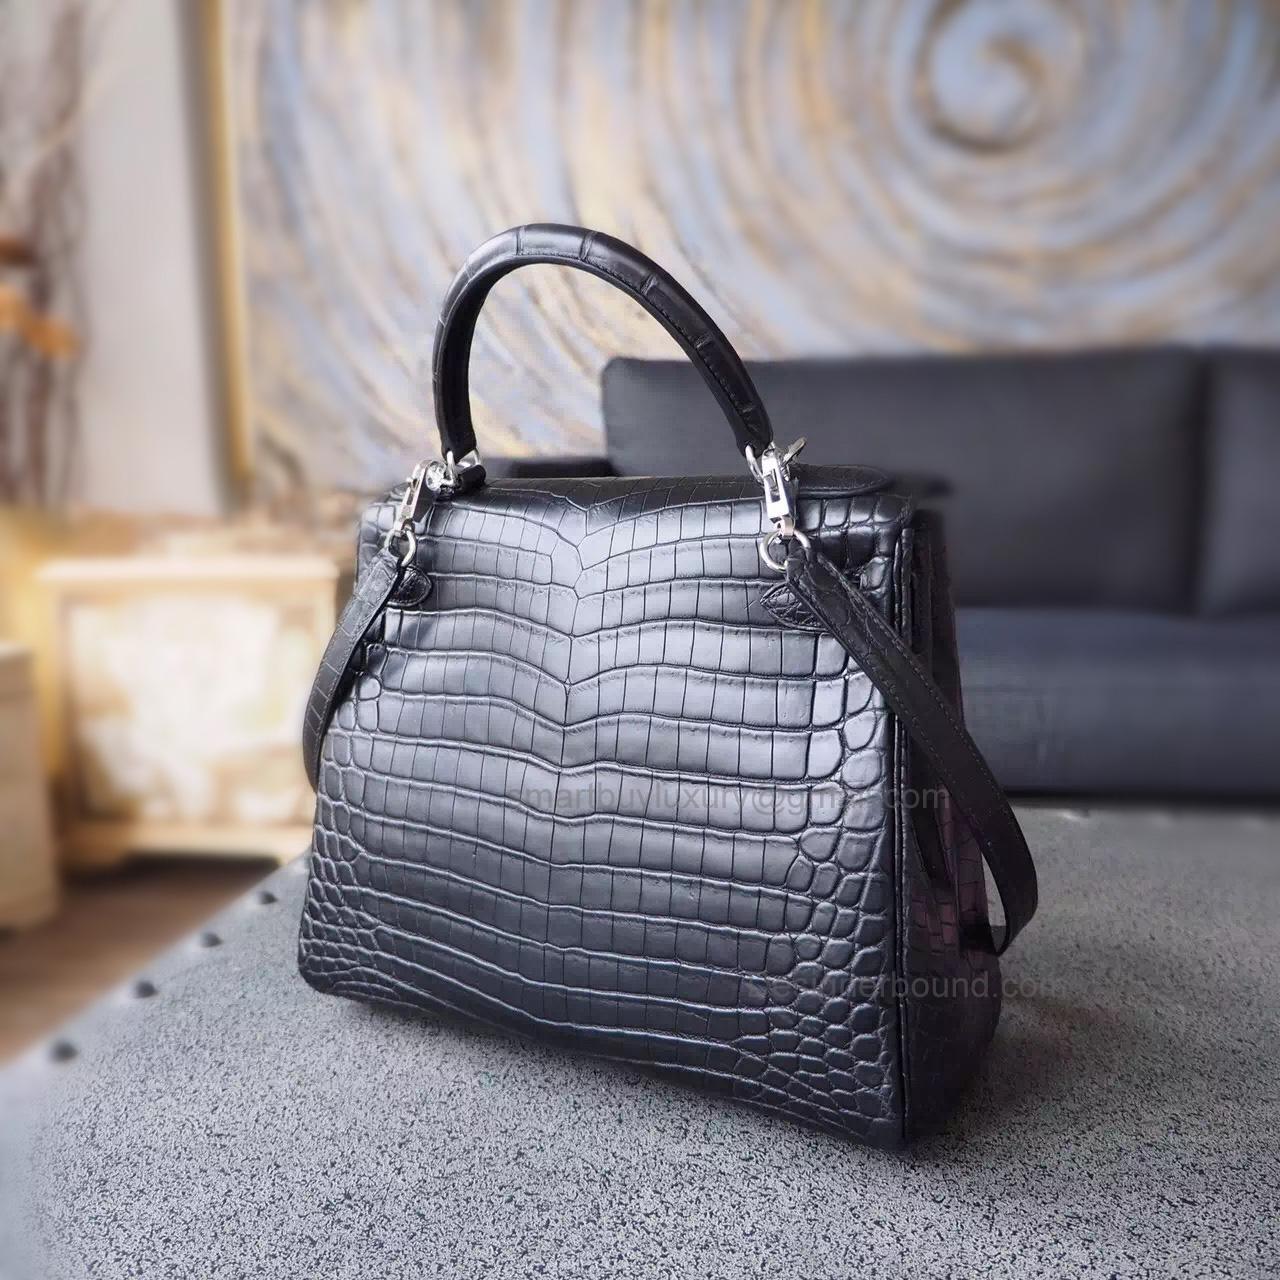 482fe63acf8d ... where can i buy replica hermes kelly 28 bag handmade in ck89 noir matte  niloticus croc